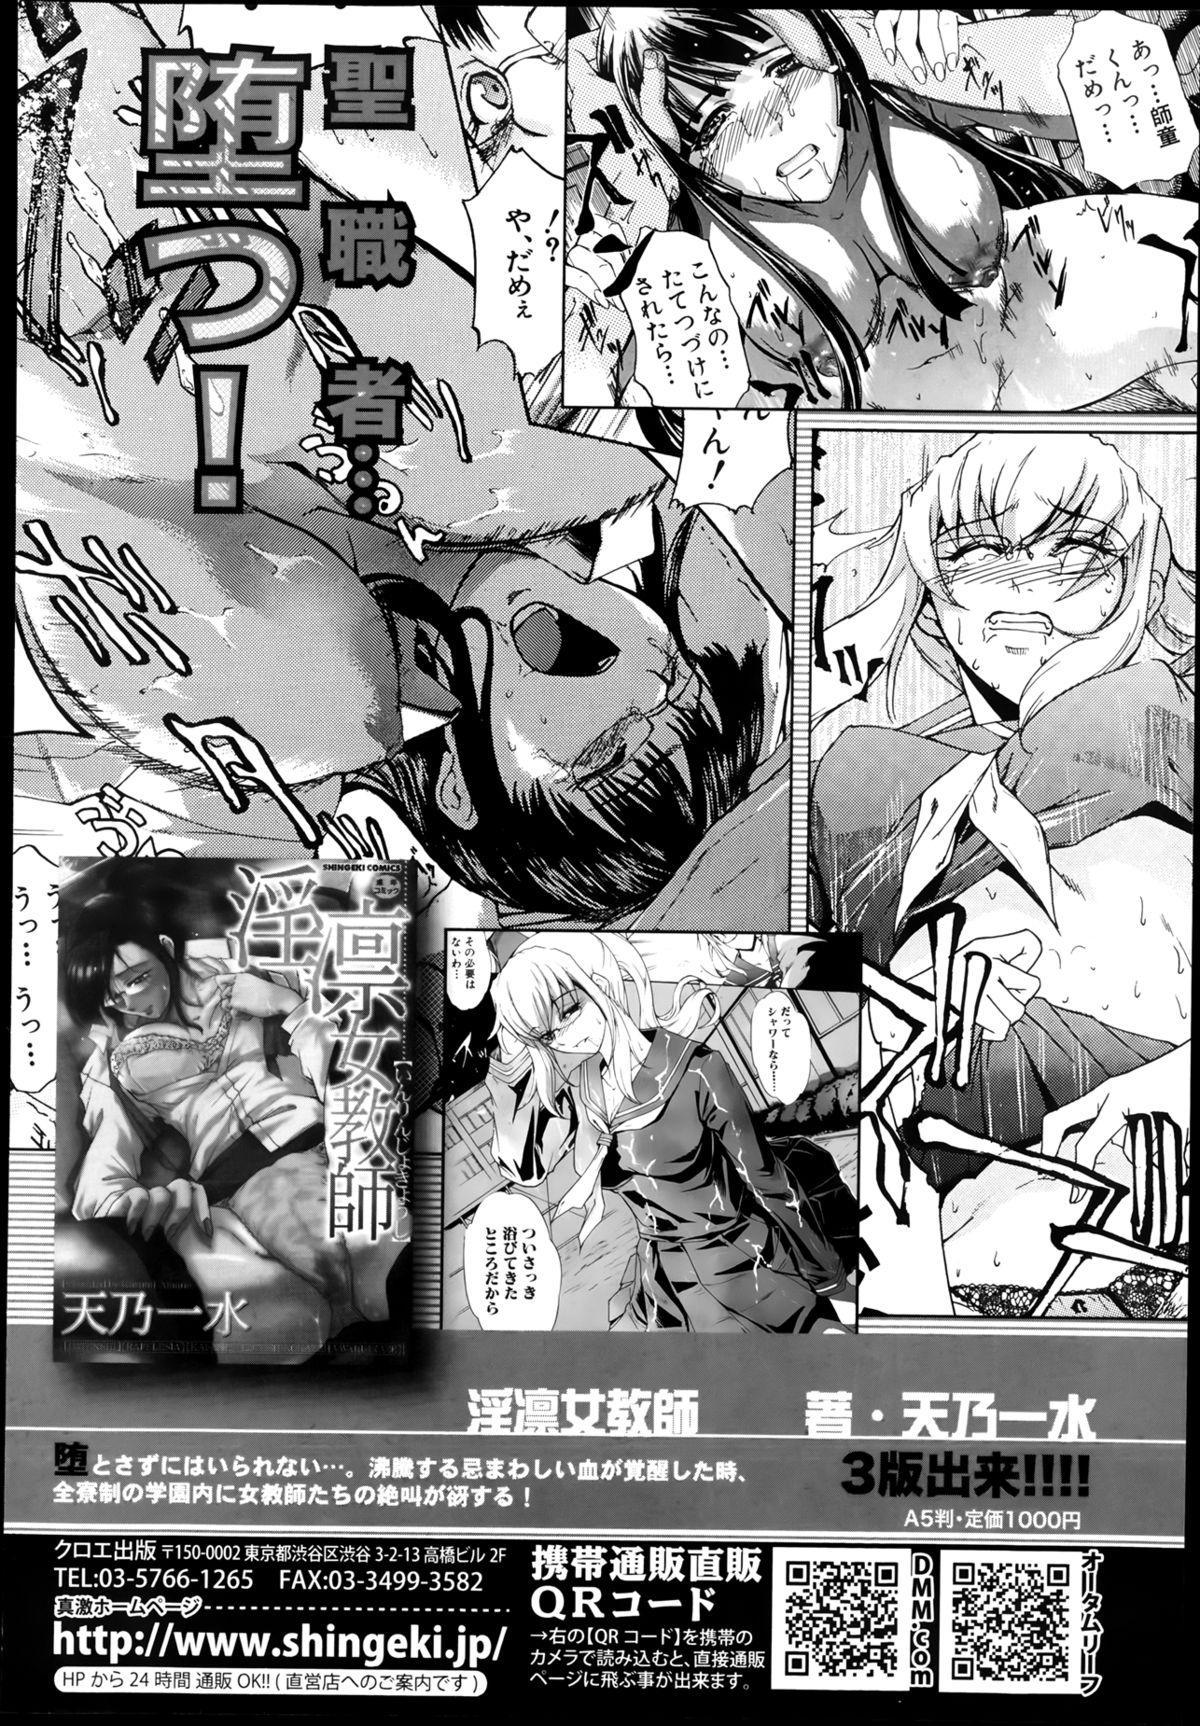 COMIC Shingeki 2013-08 271